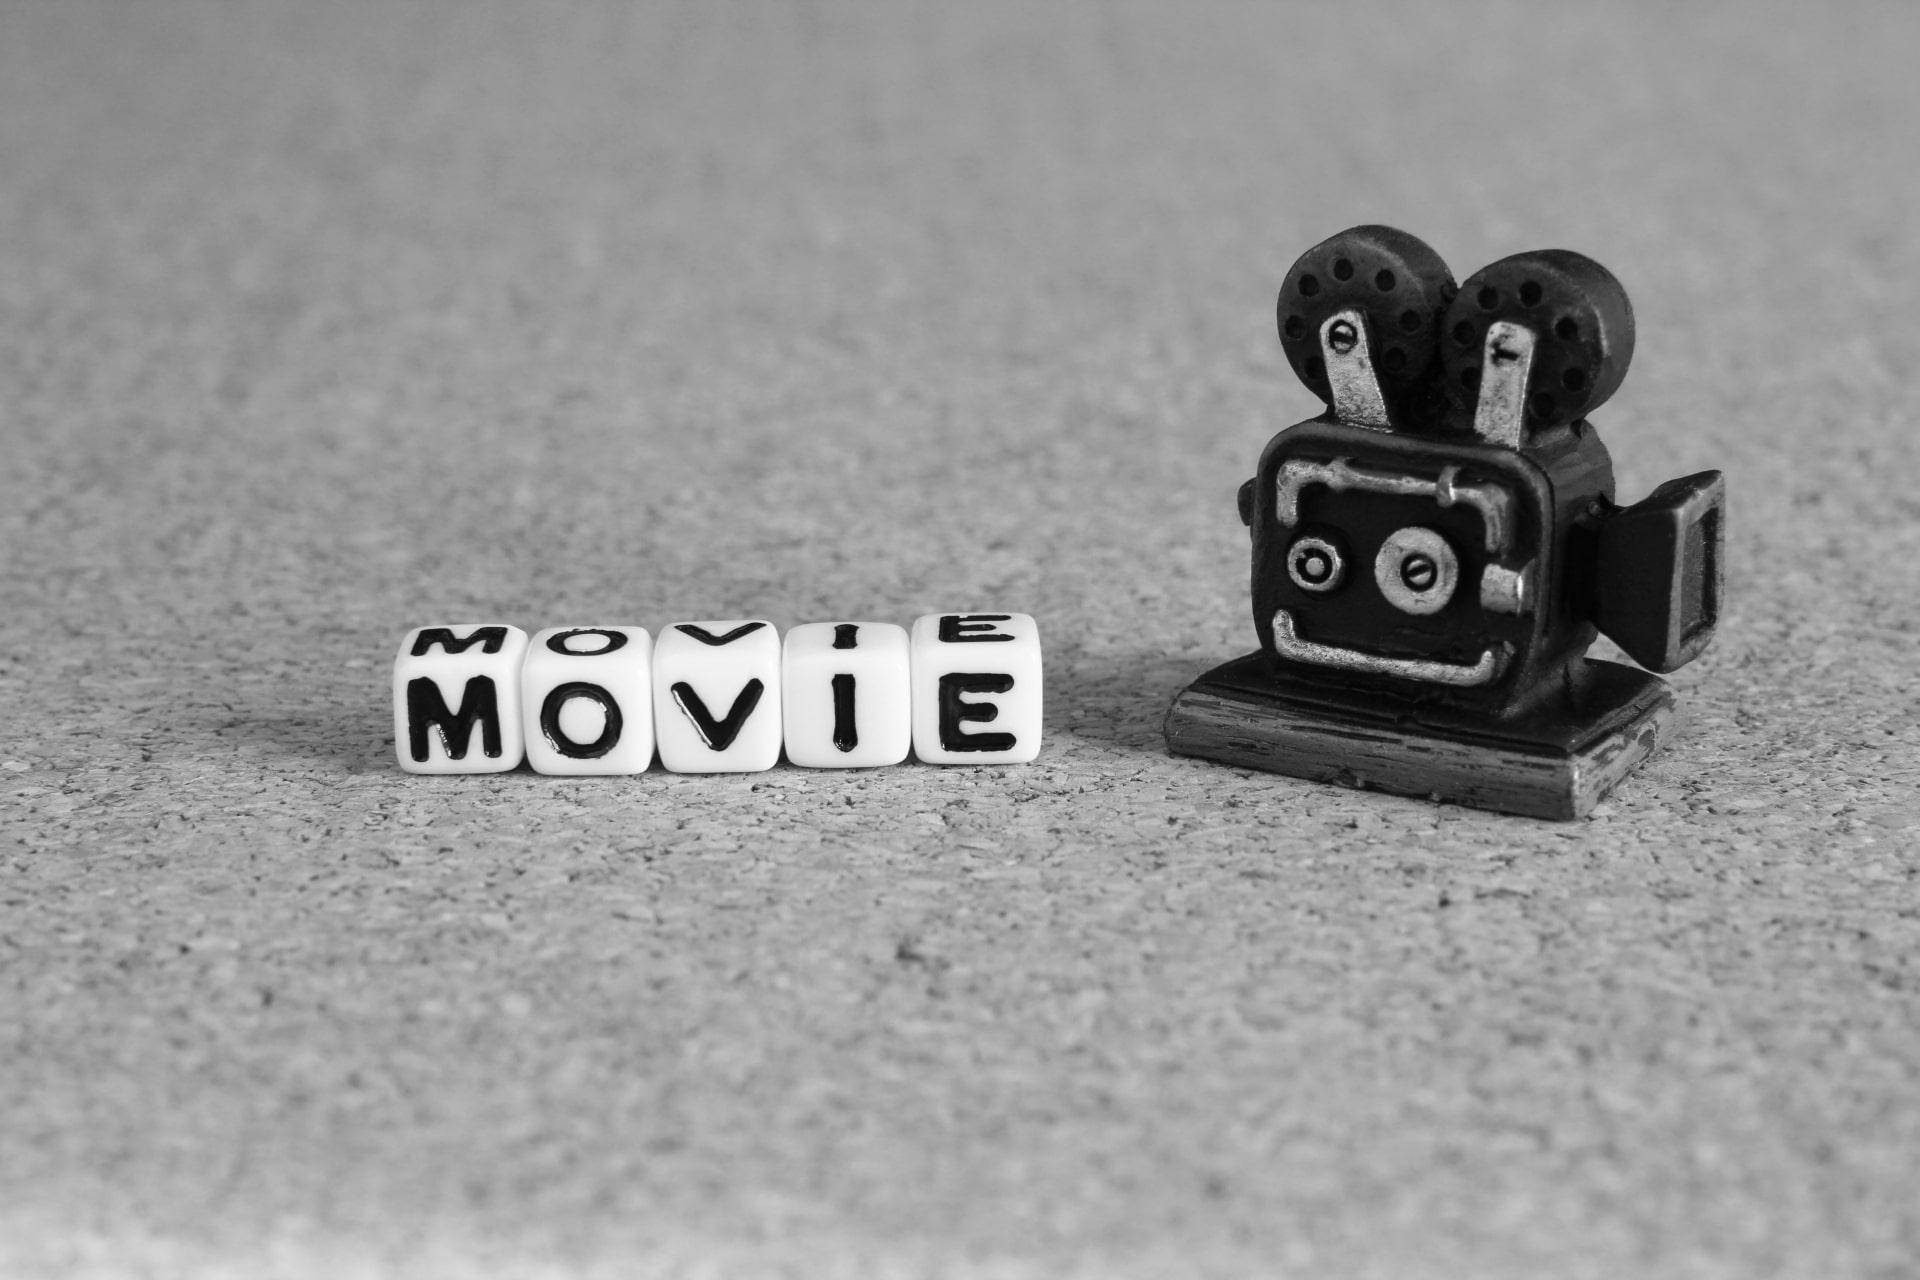 MOVIEの文字とカメラ